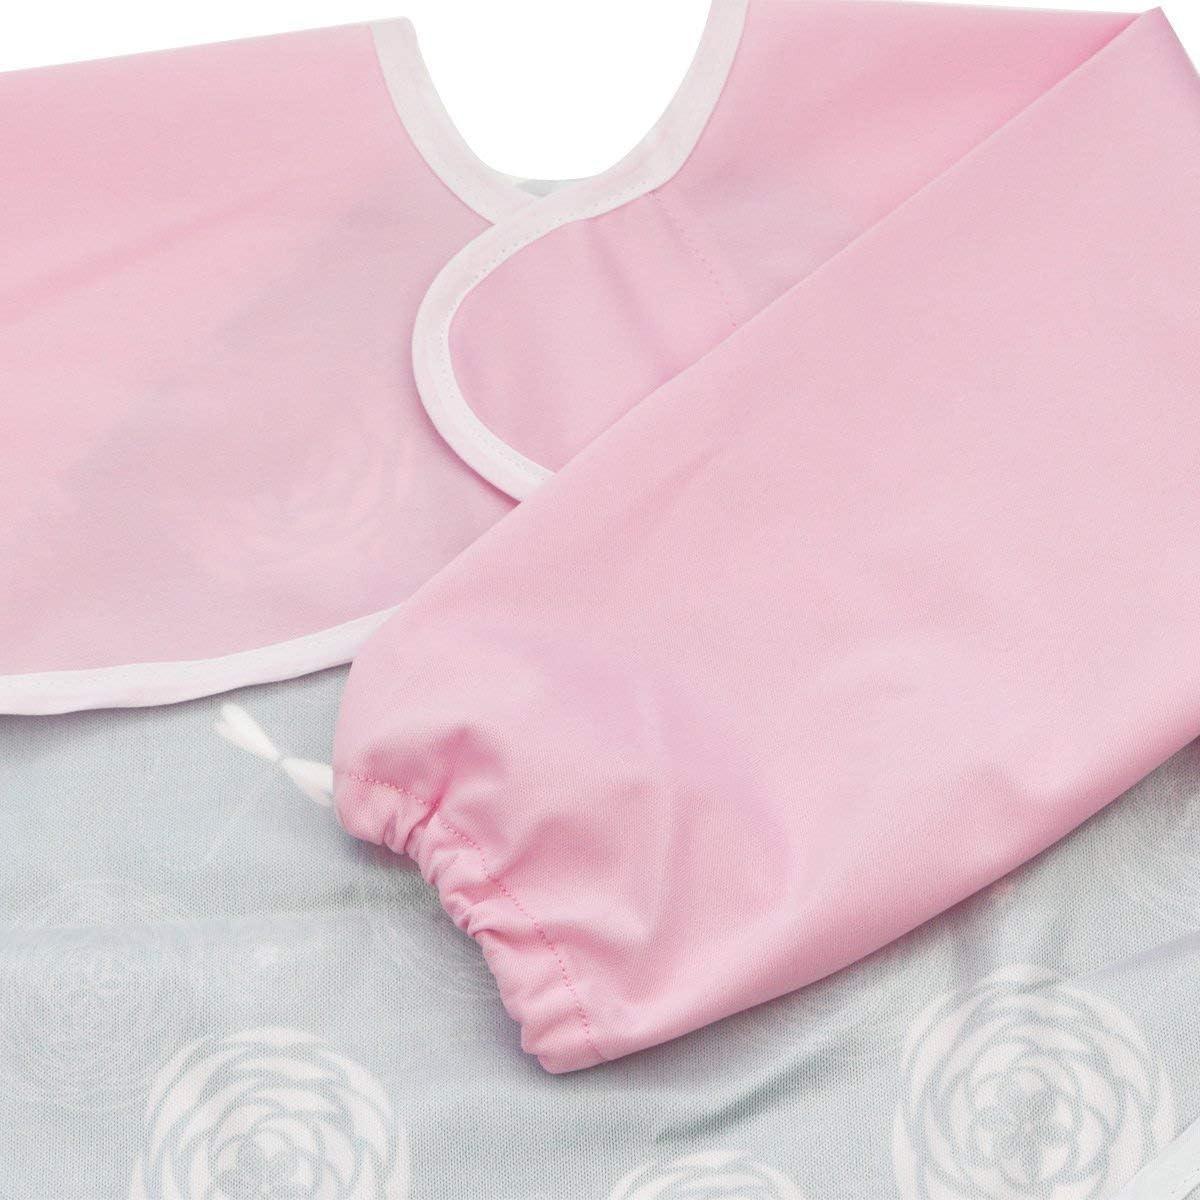 Moyhza Long Sleeved Baby Bib Waterproof Toddler Bib with Pocket,6-24 Months